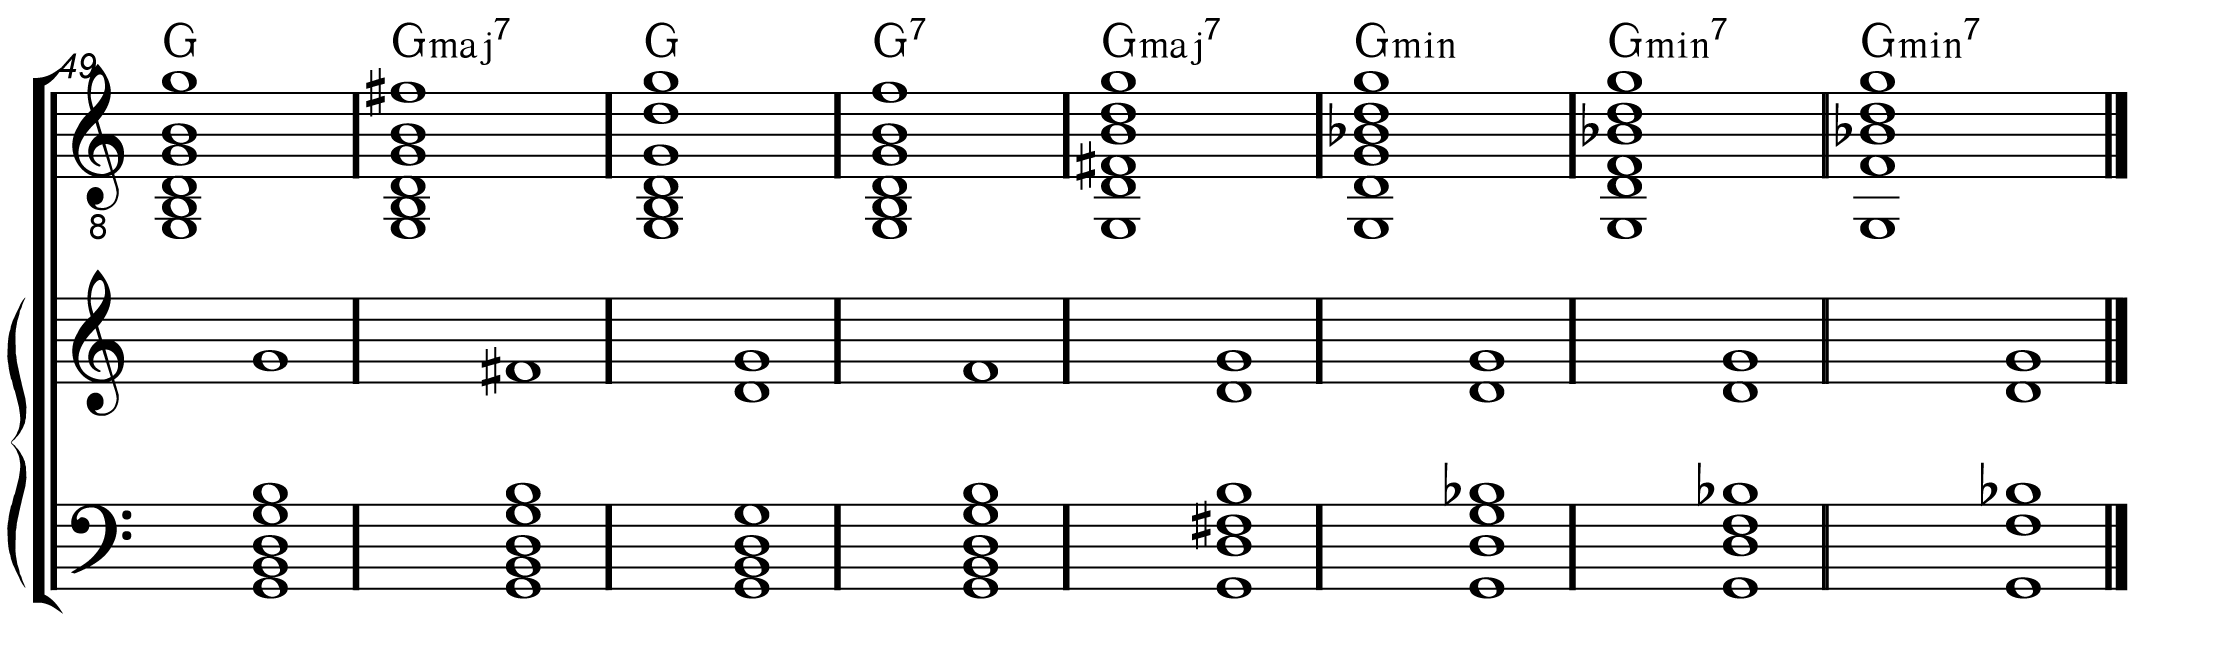 http://mypianokeys.com/wp-content/uploads/2014/12/c7-piano-chord-6.jpg